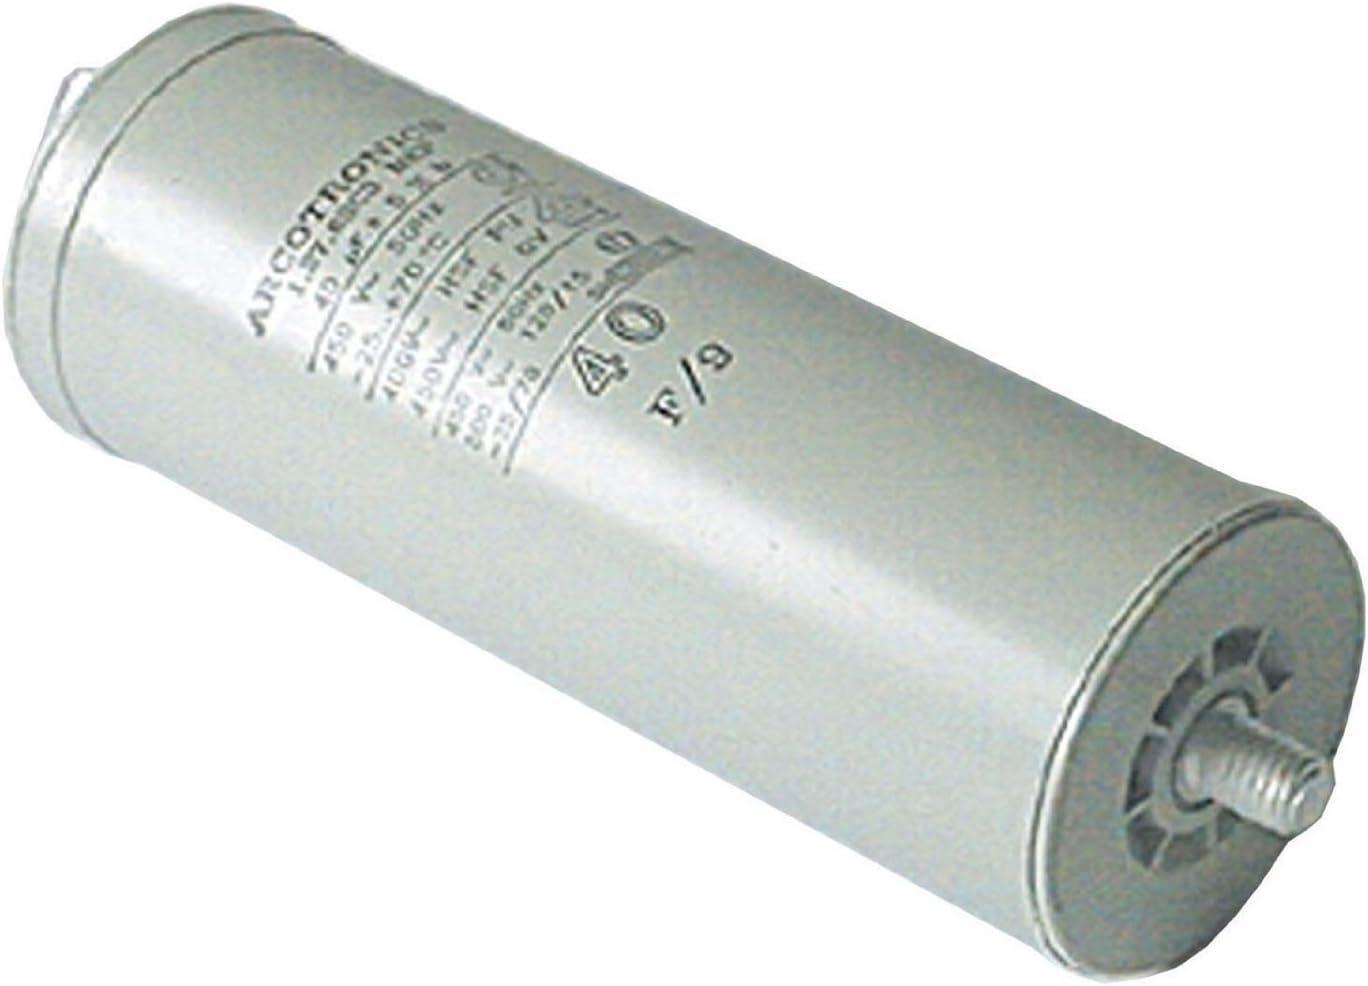 Spade Connector//Tags Spares2go Start Run Motor Capacitors For Samsung Appliances Microfarad 10UF